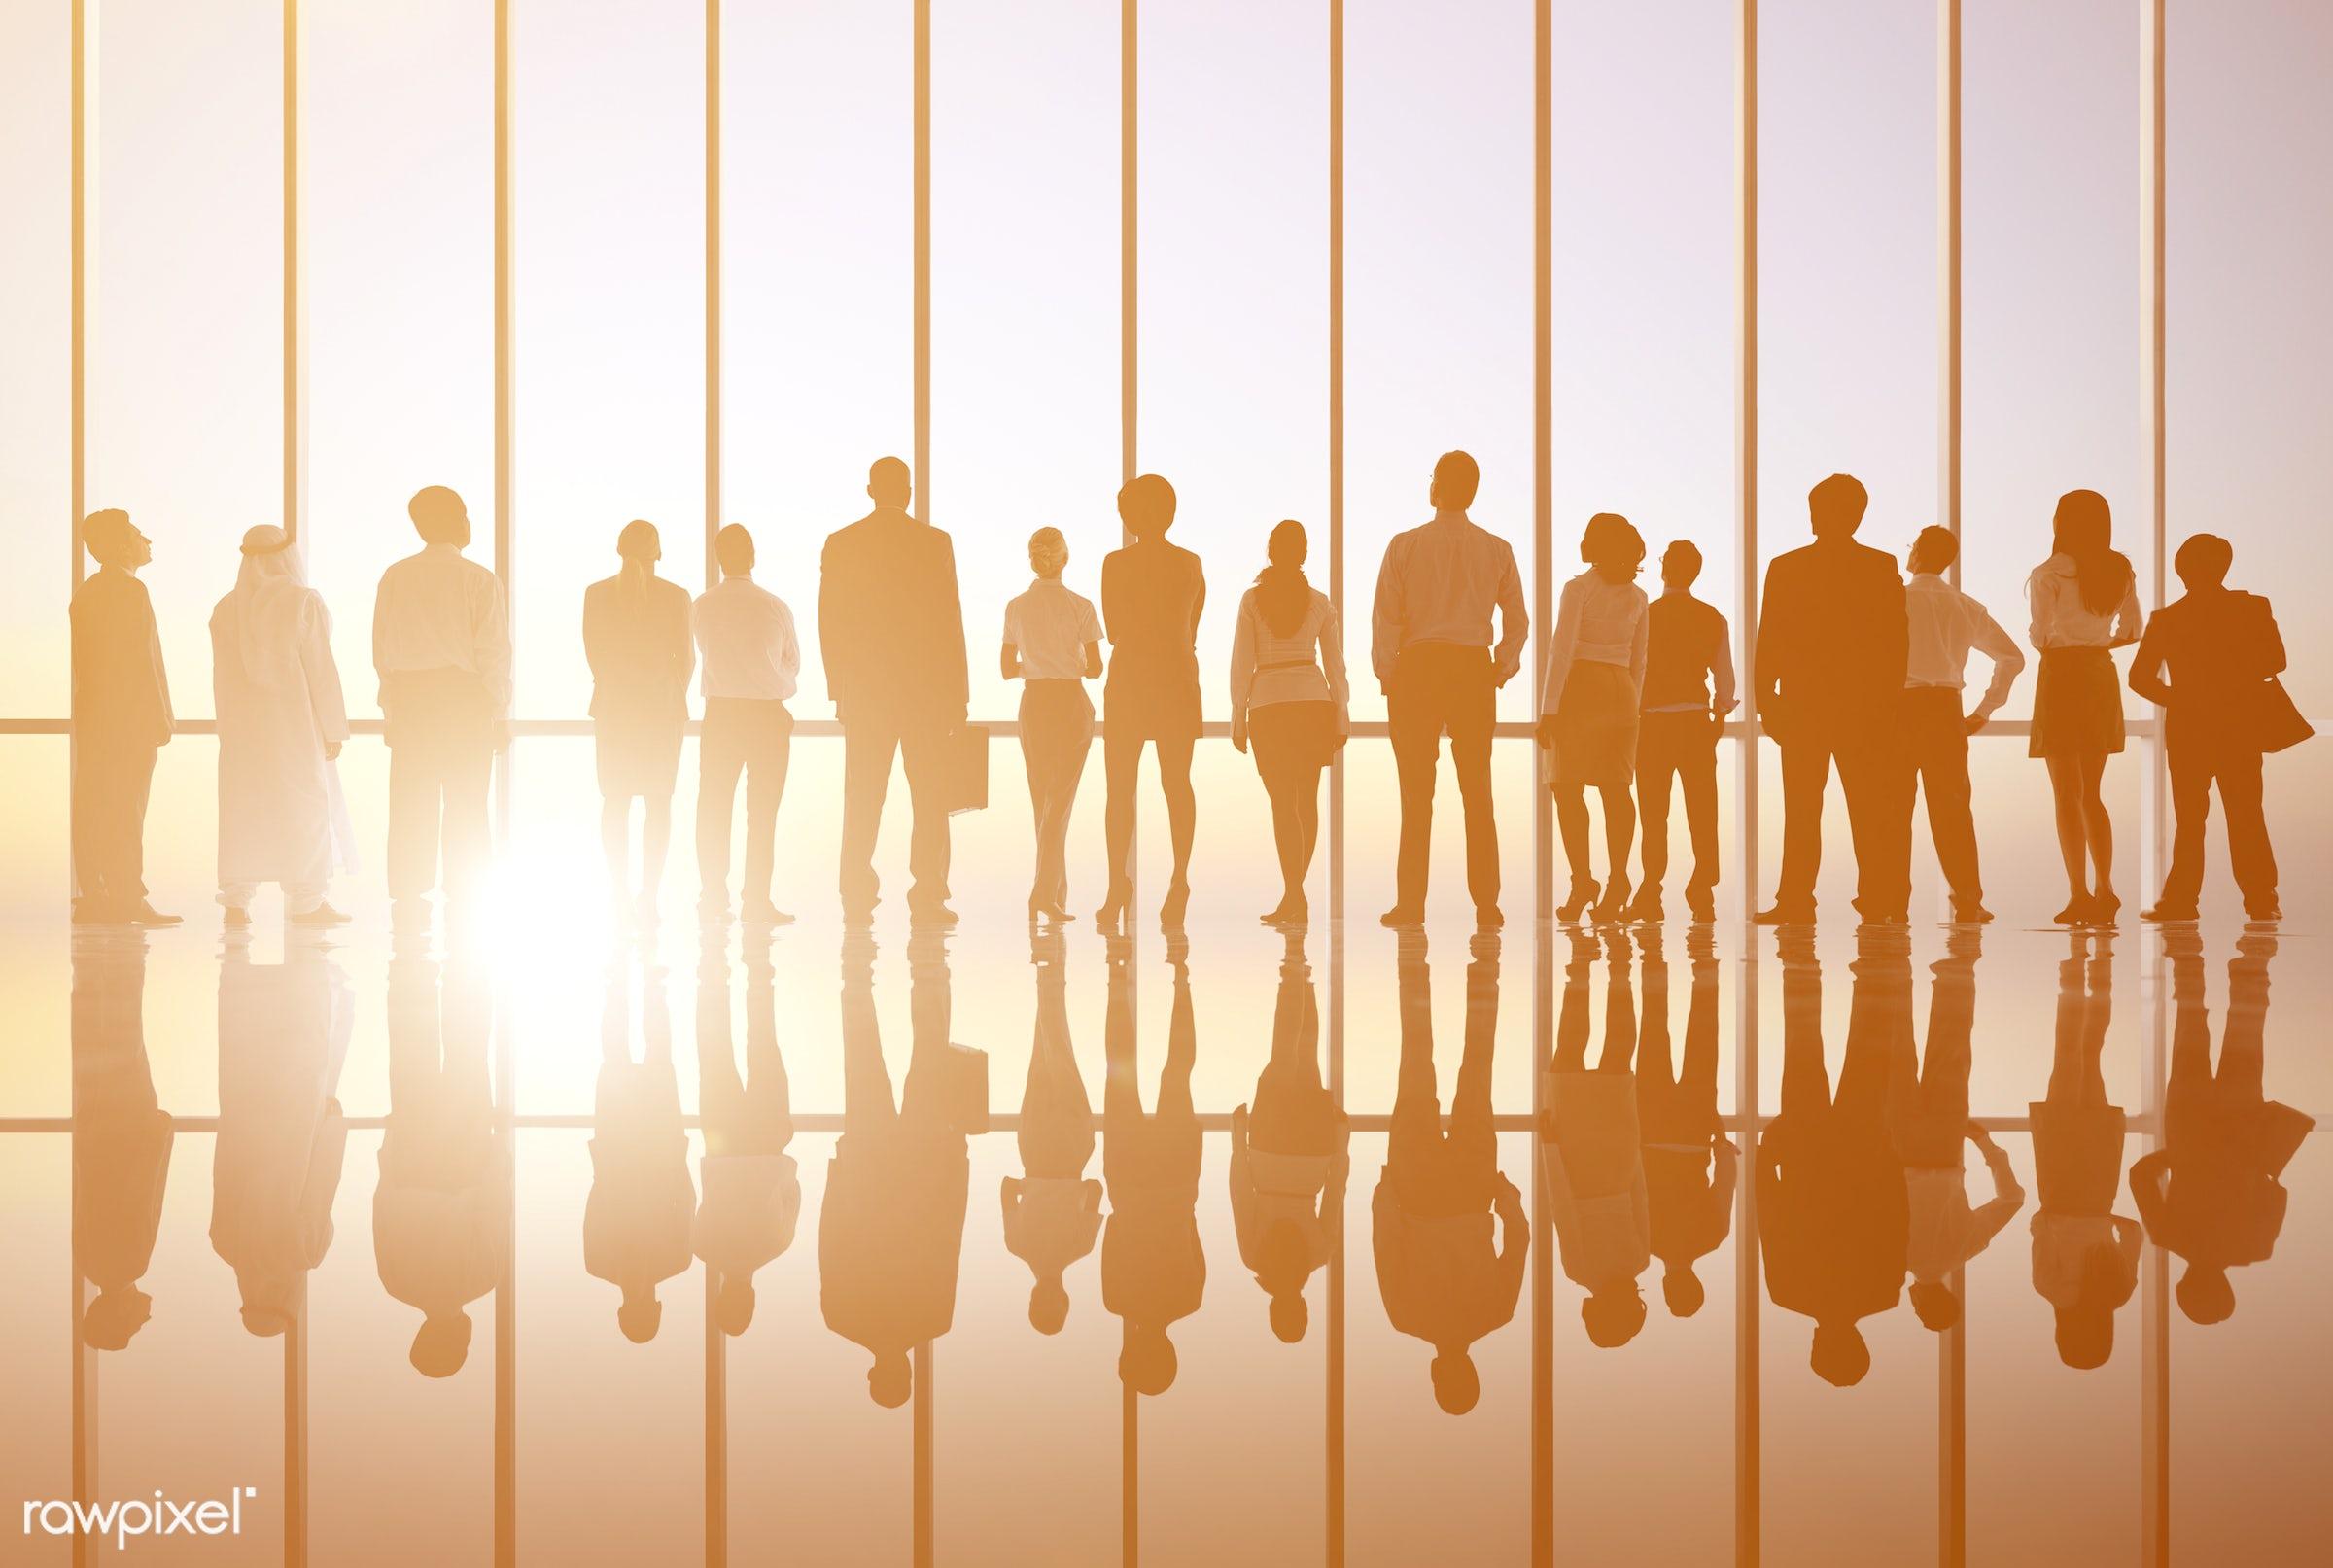 caucasian, adult, african descent, asian ethnicity, business, business people, business person, business team, businessman,...